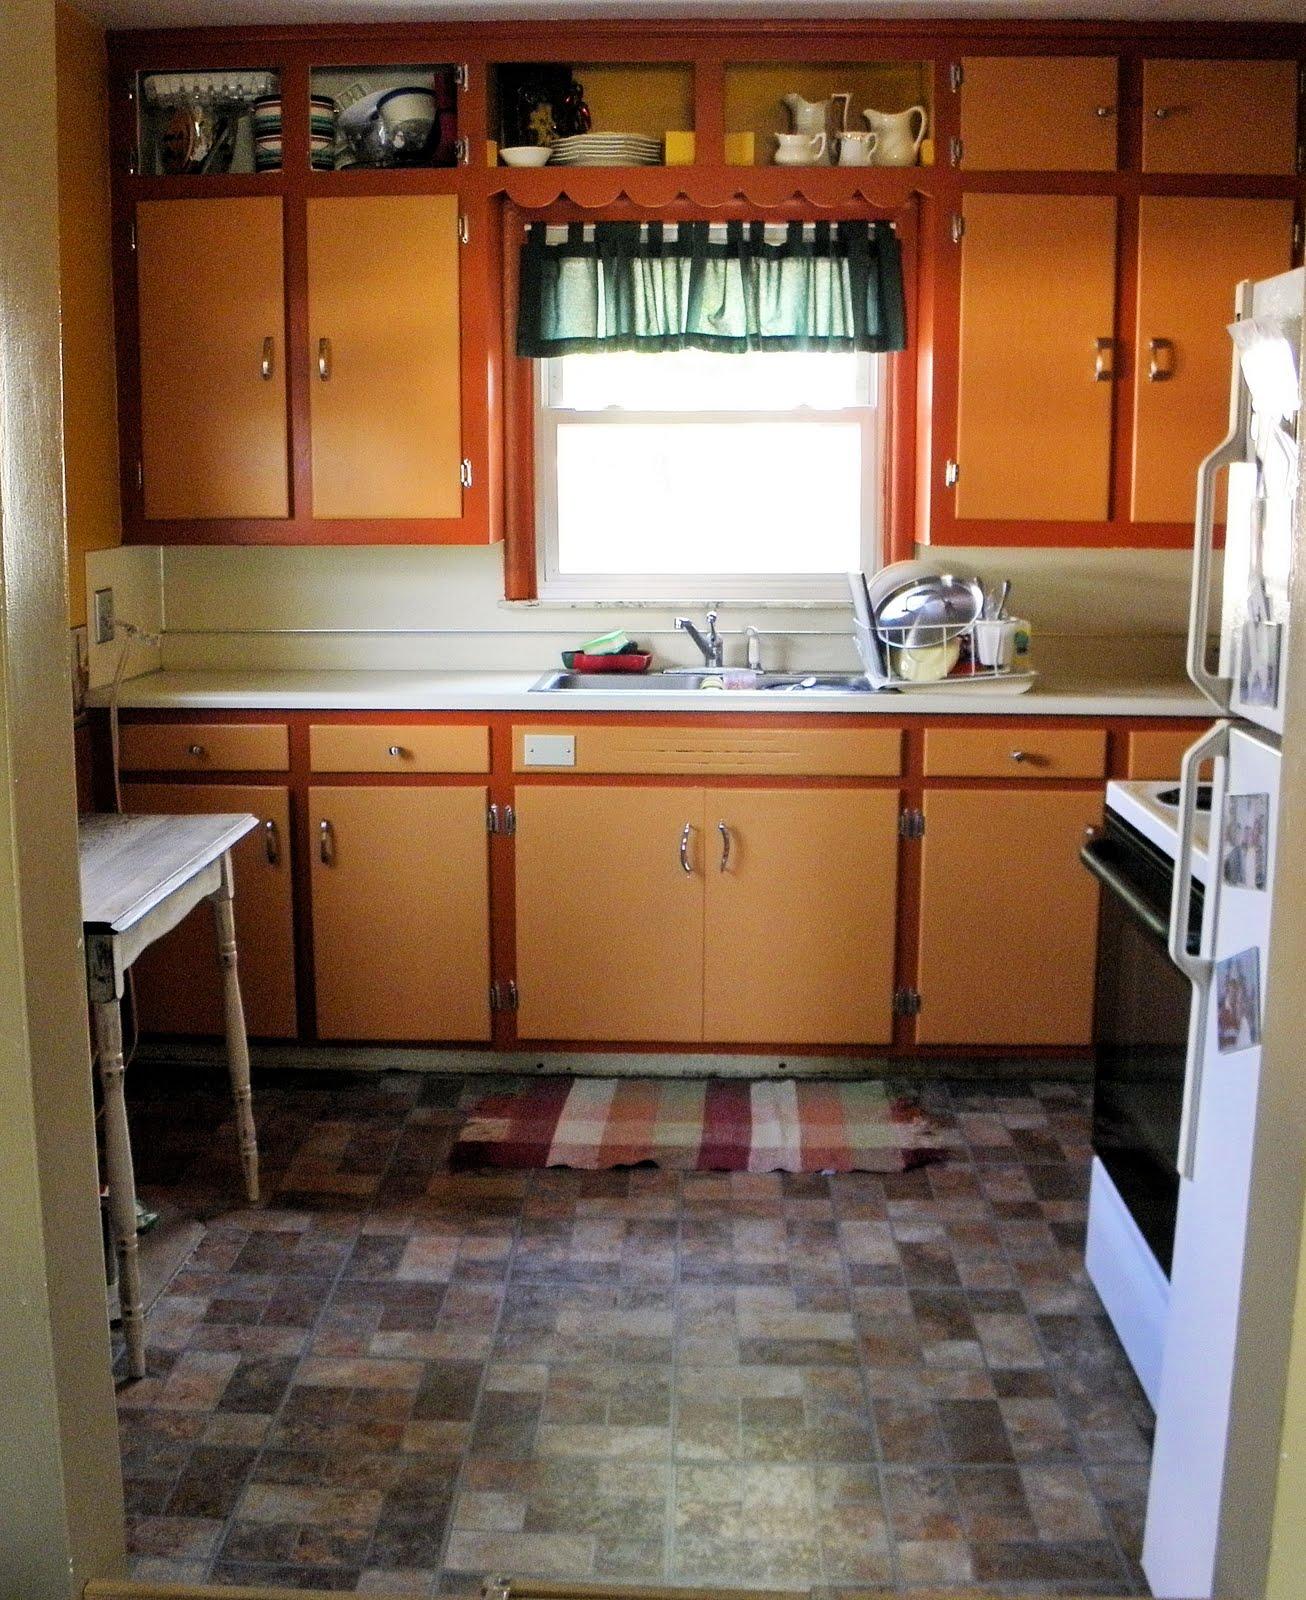 Shabby Love Stripping Kitchen Cabinets Tutorial